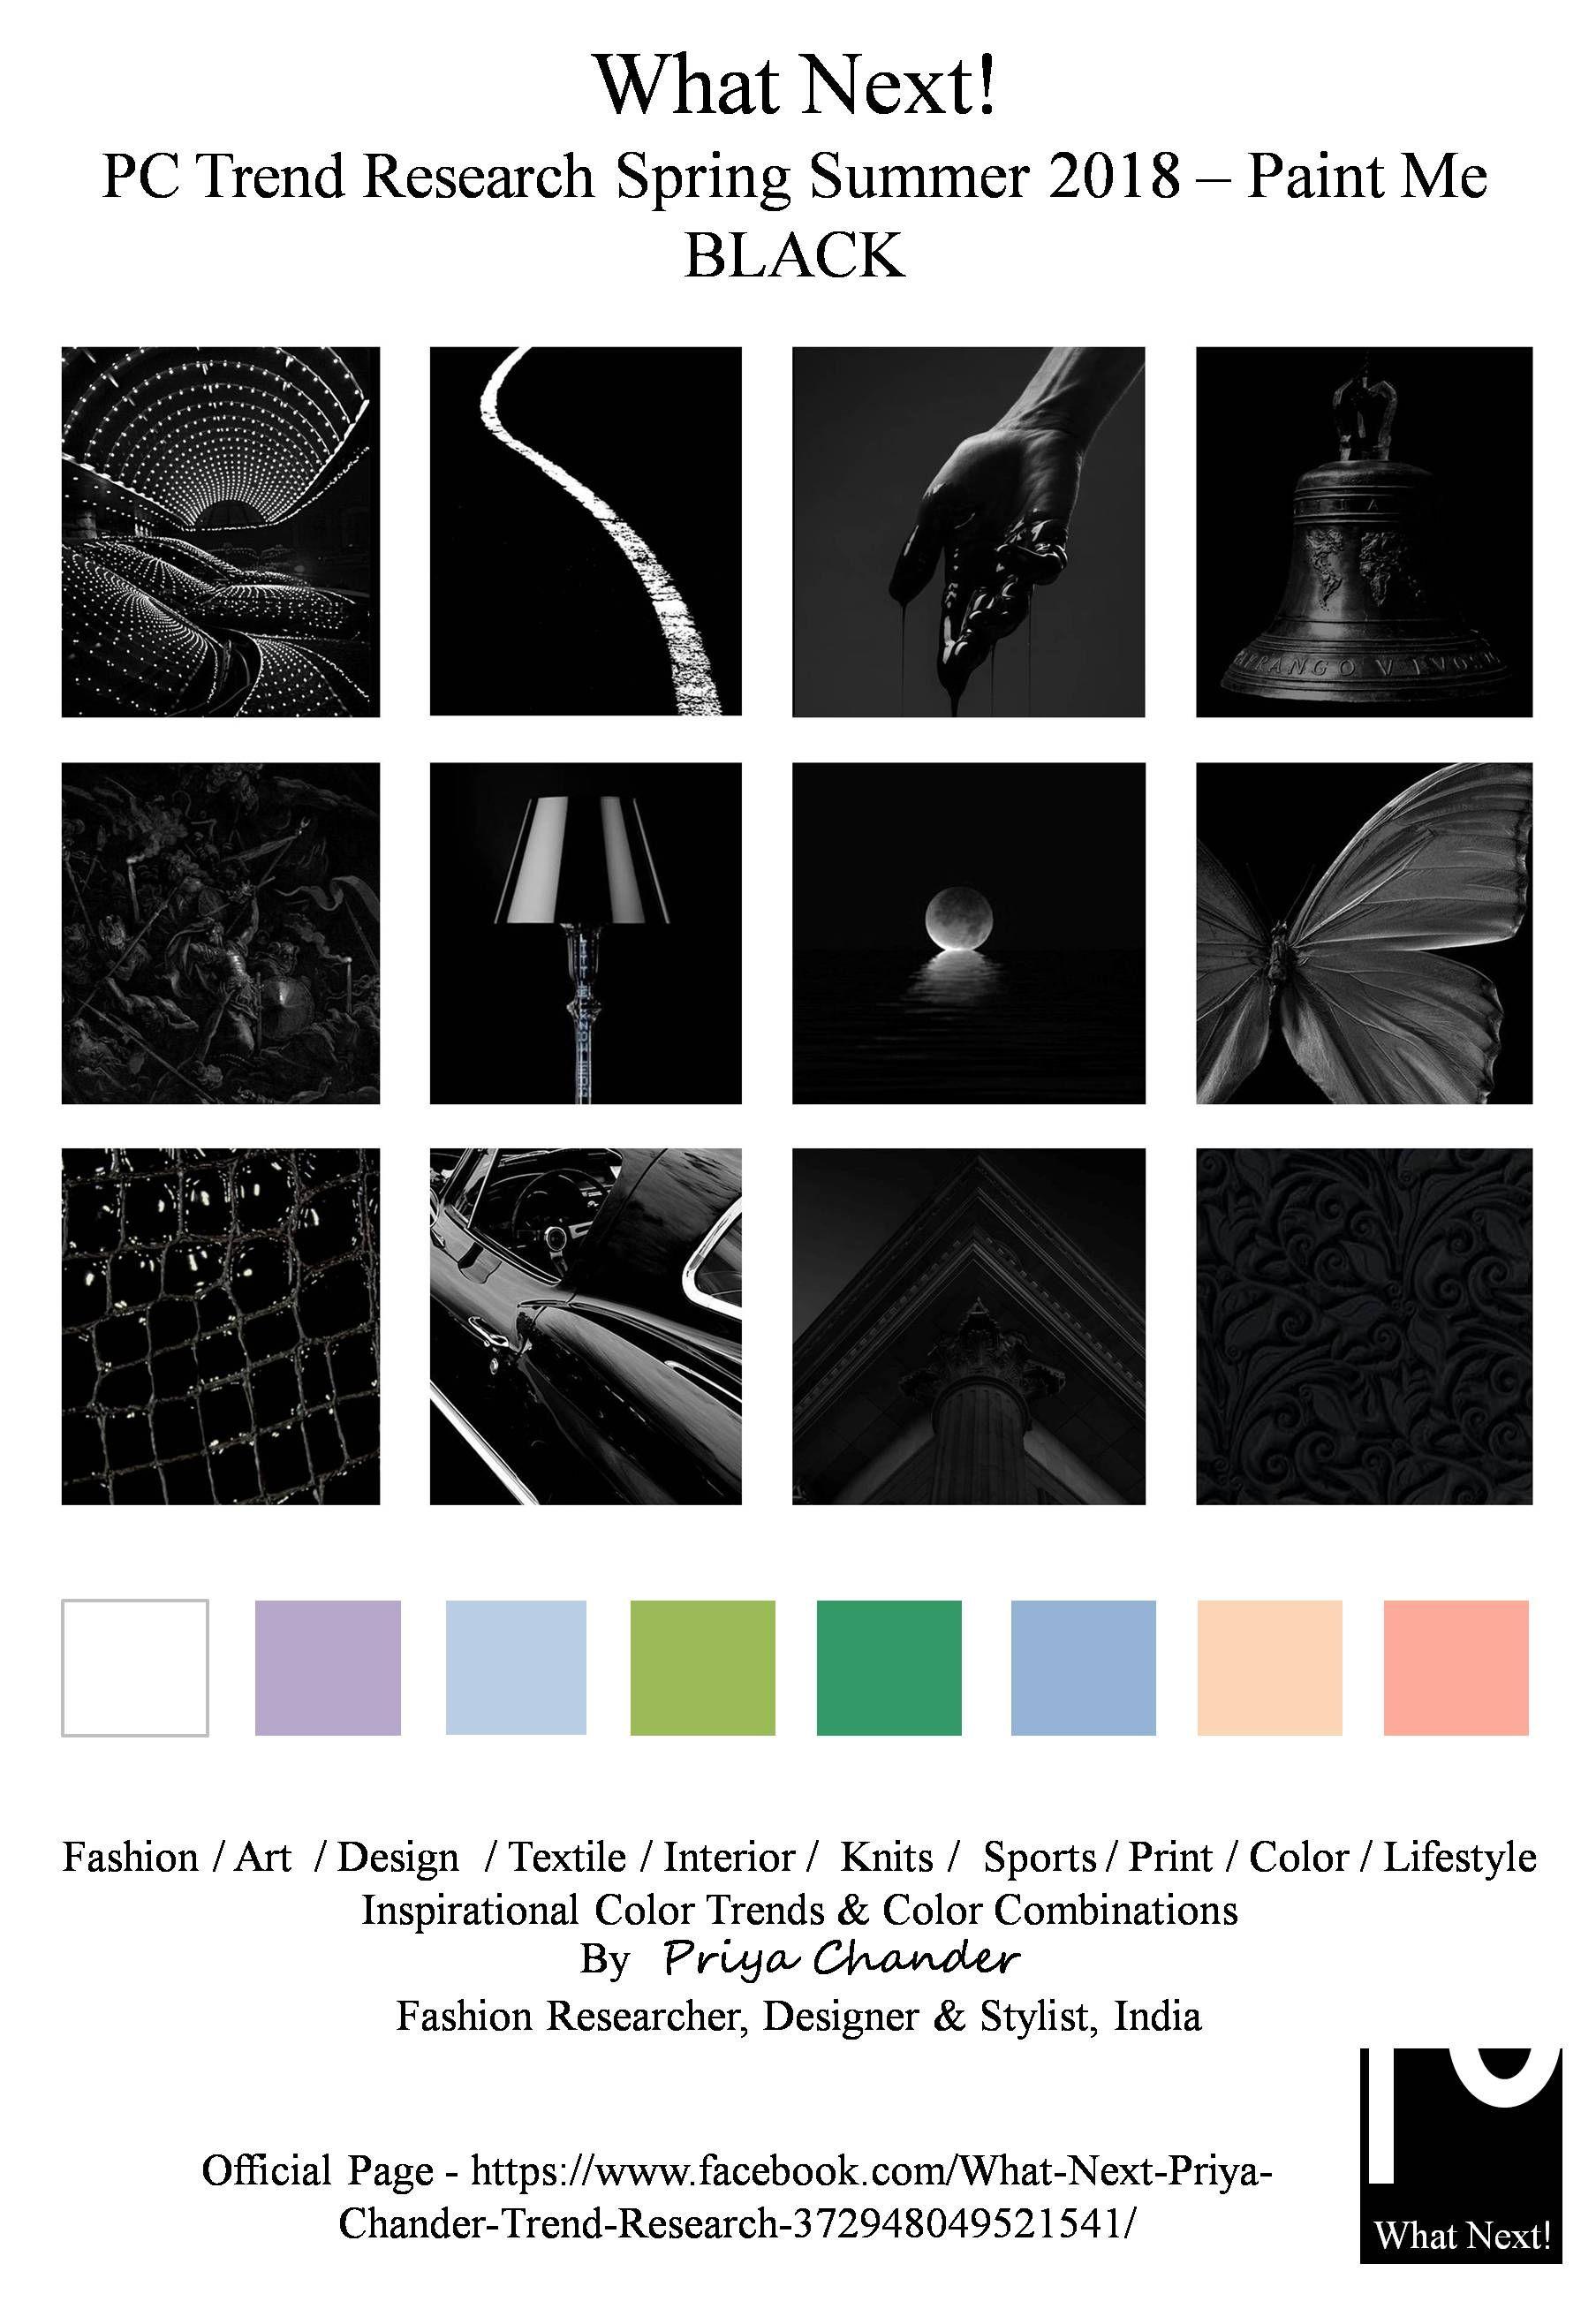 Black paintmeblack S/S 2018 fashionista Pantone